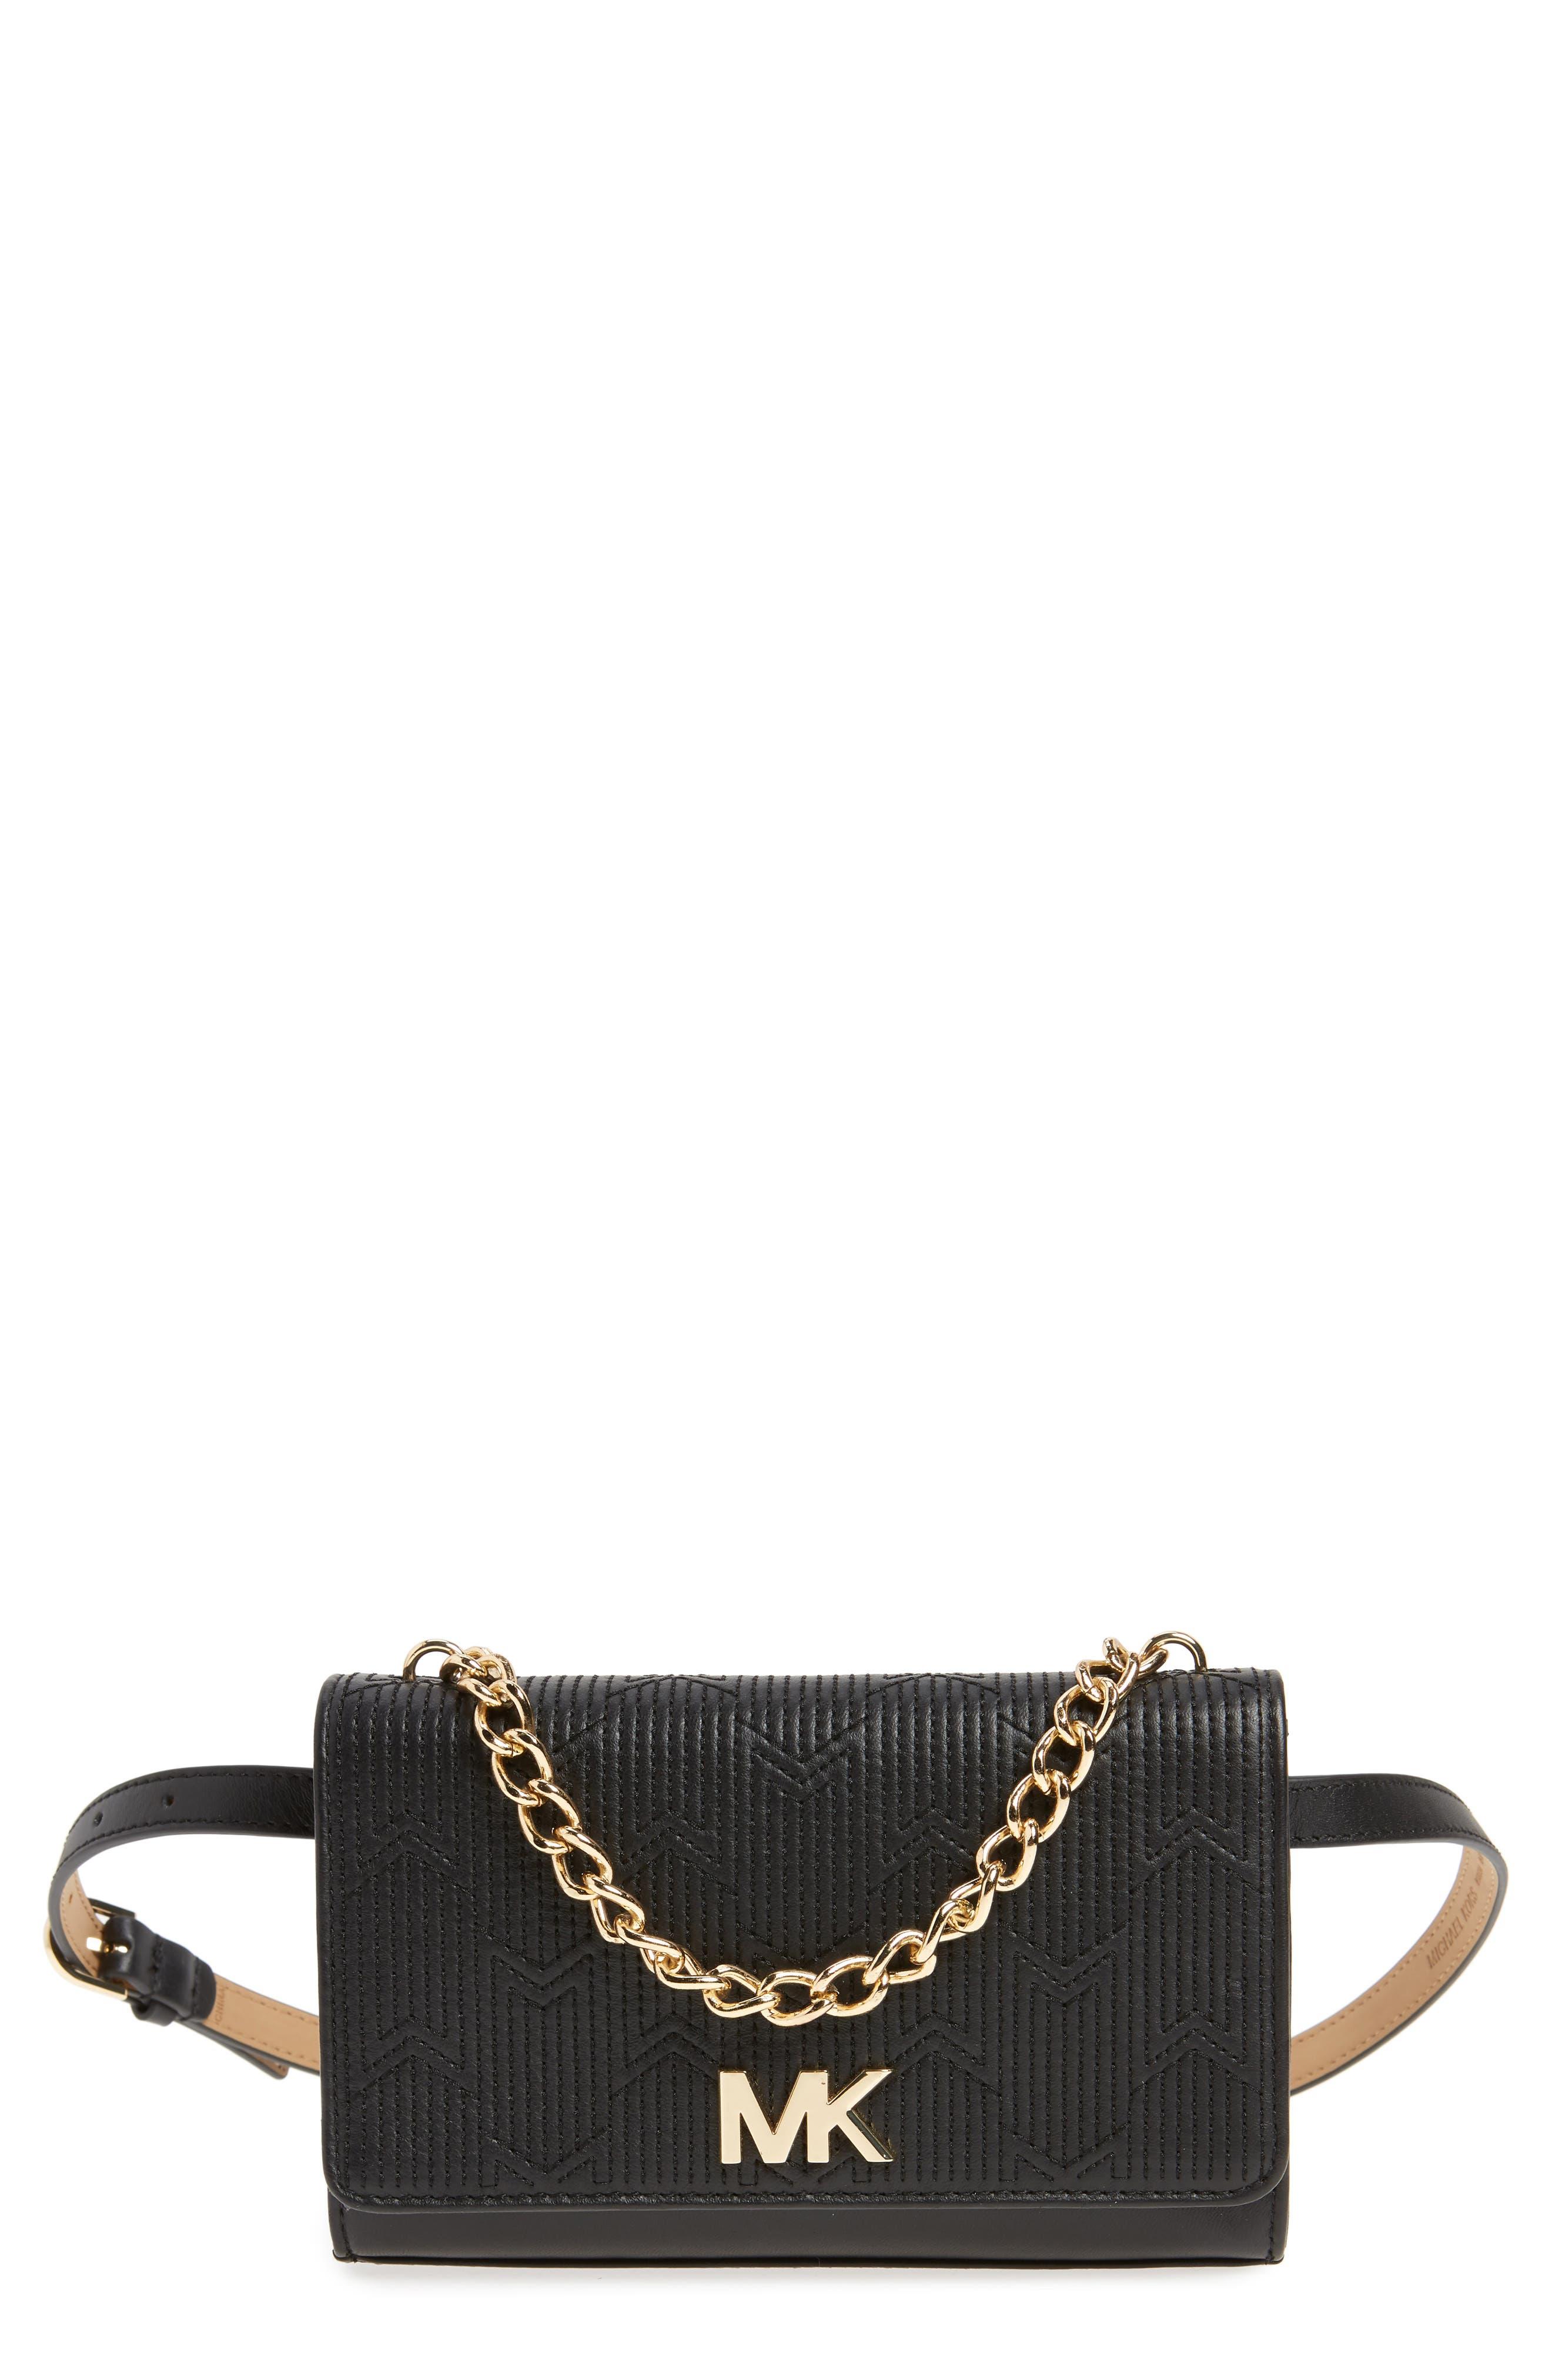 Deco M Quilted Leather Belt Bag,                             Main thumbnail 1, color,                             BLACK